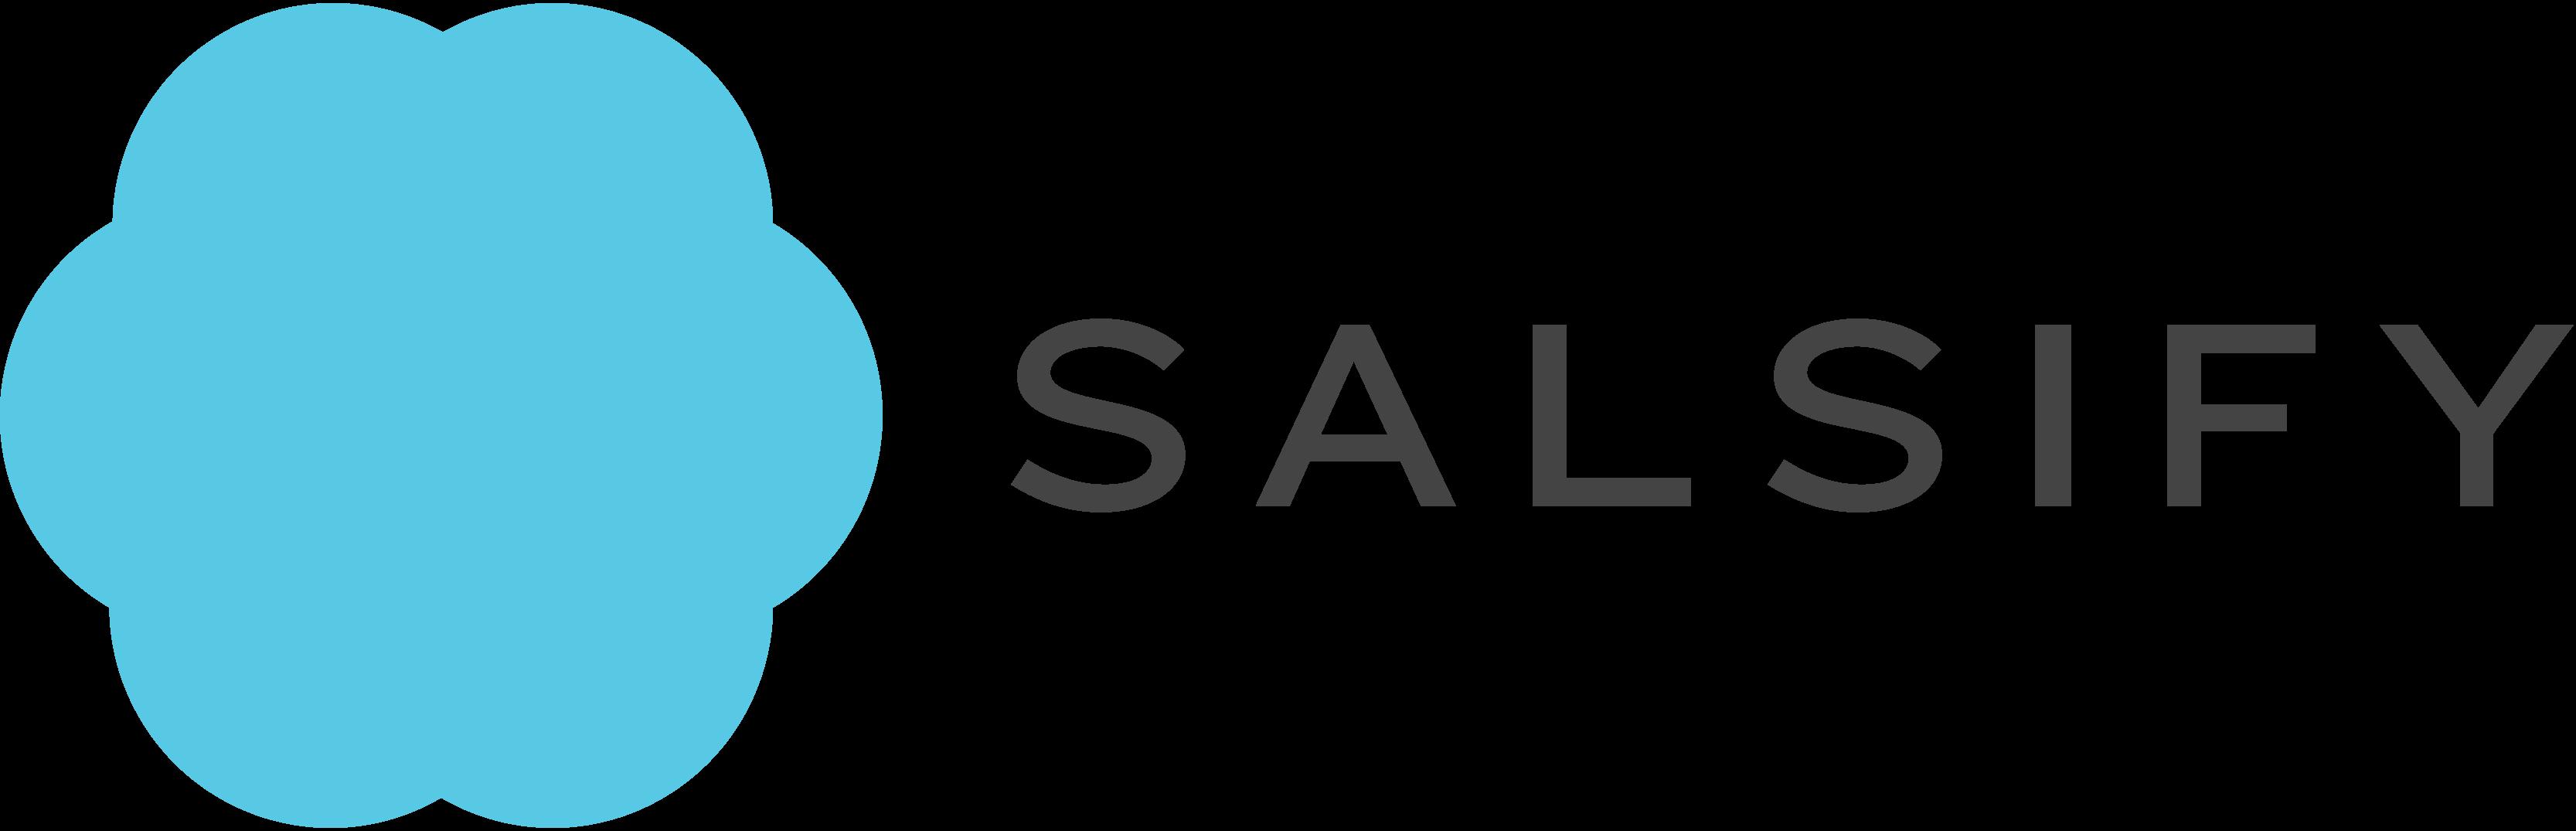 Salsify_Logo_Blue_Flower_Gray_Text-01.png